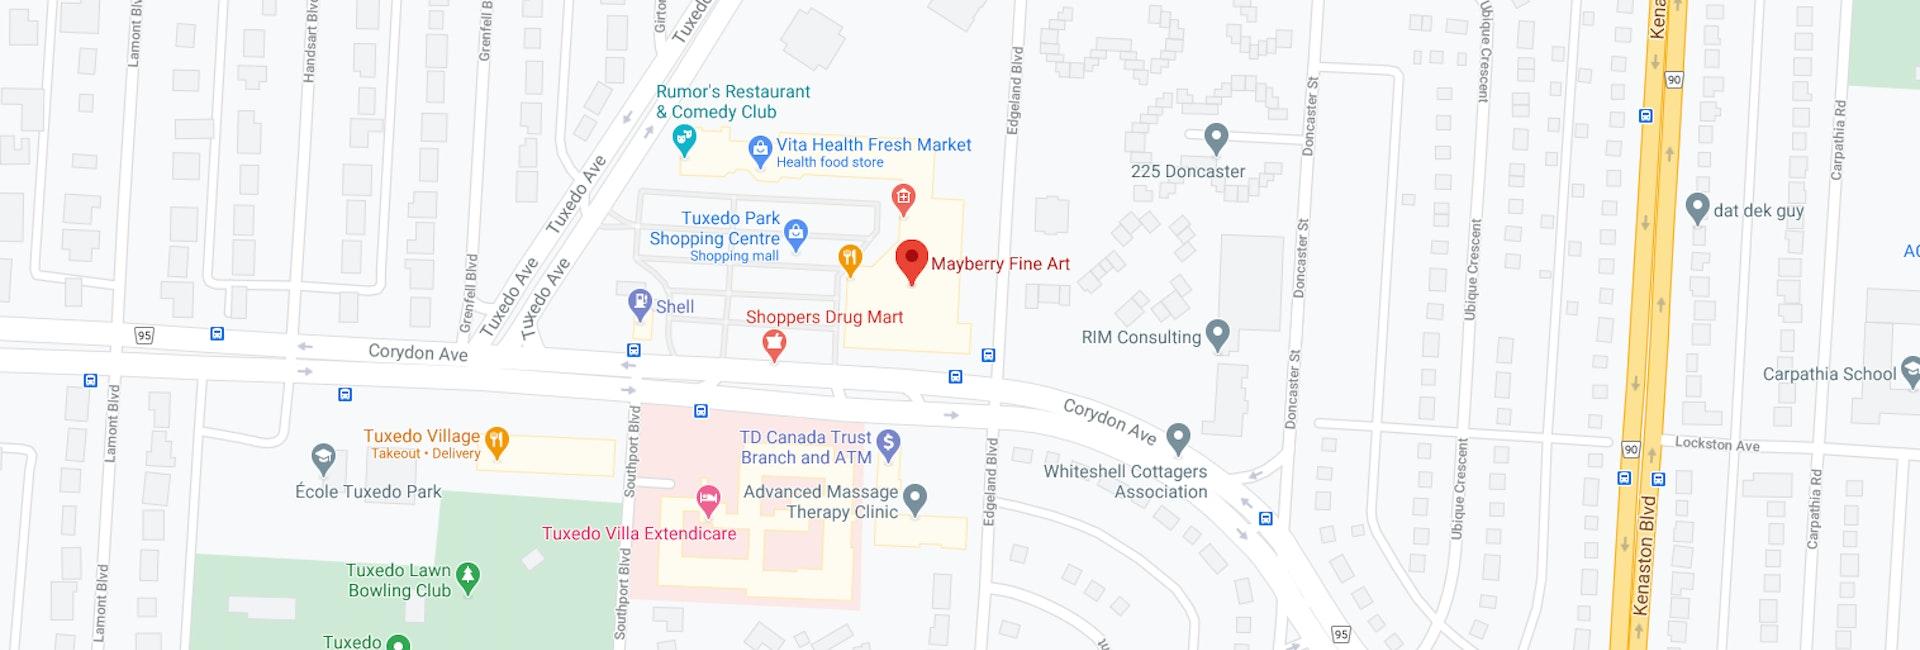 Google Maps Mayberry Fine Art WInnipeg Tuxedo Location